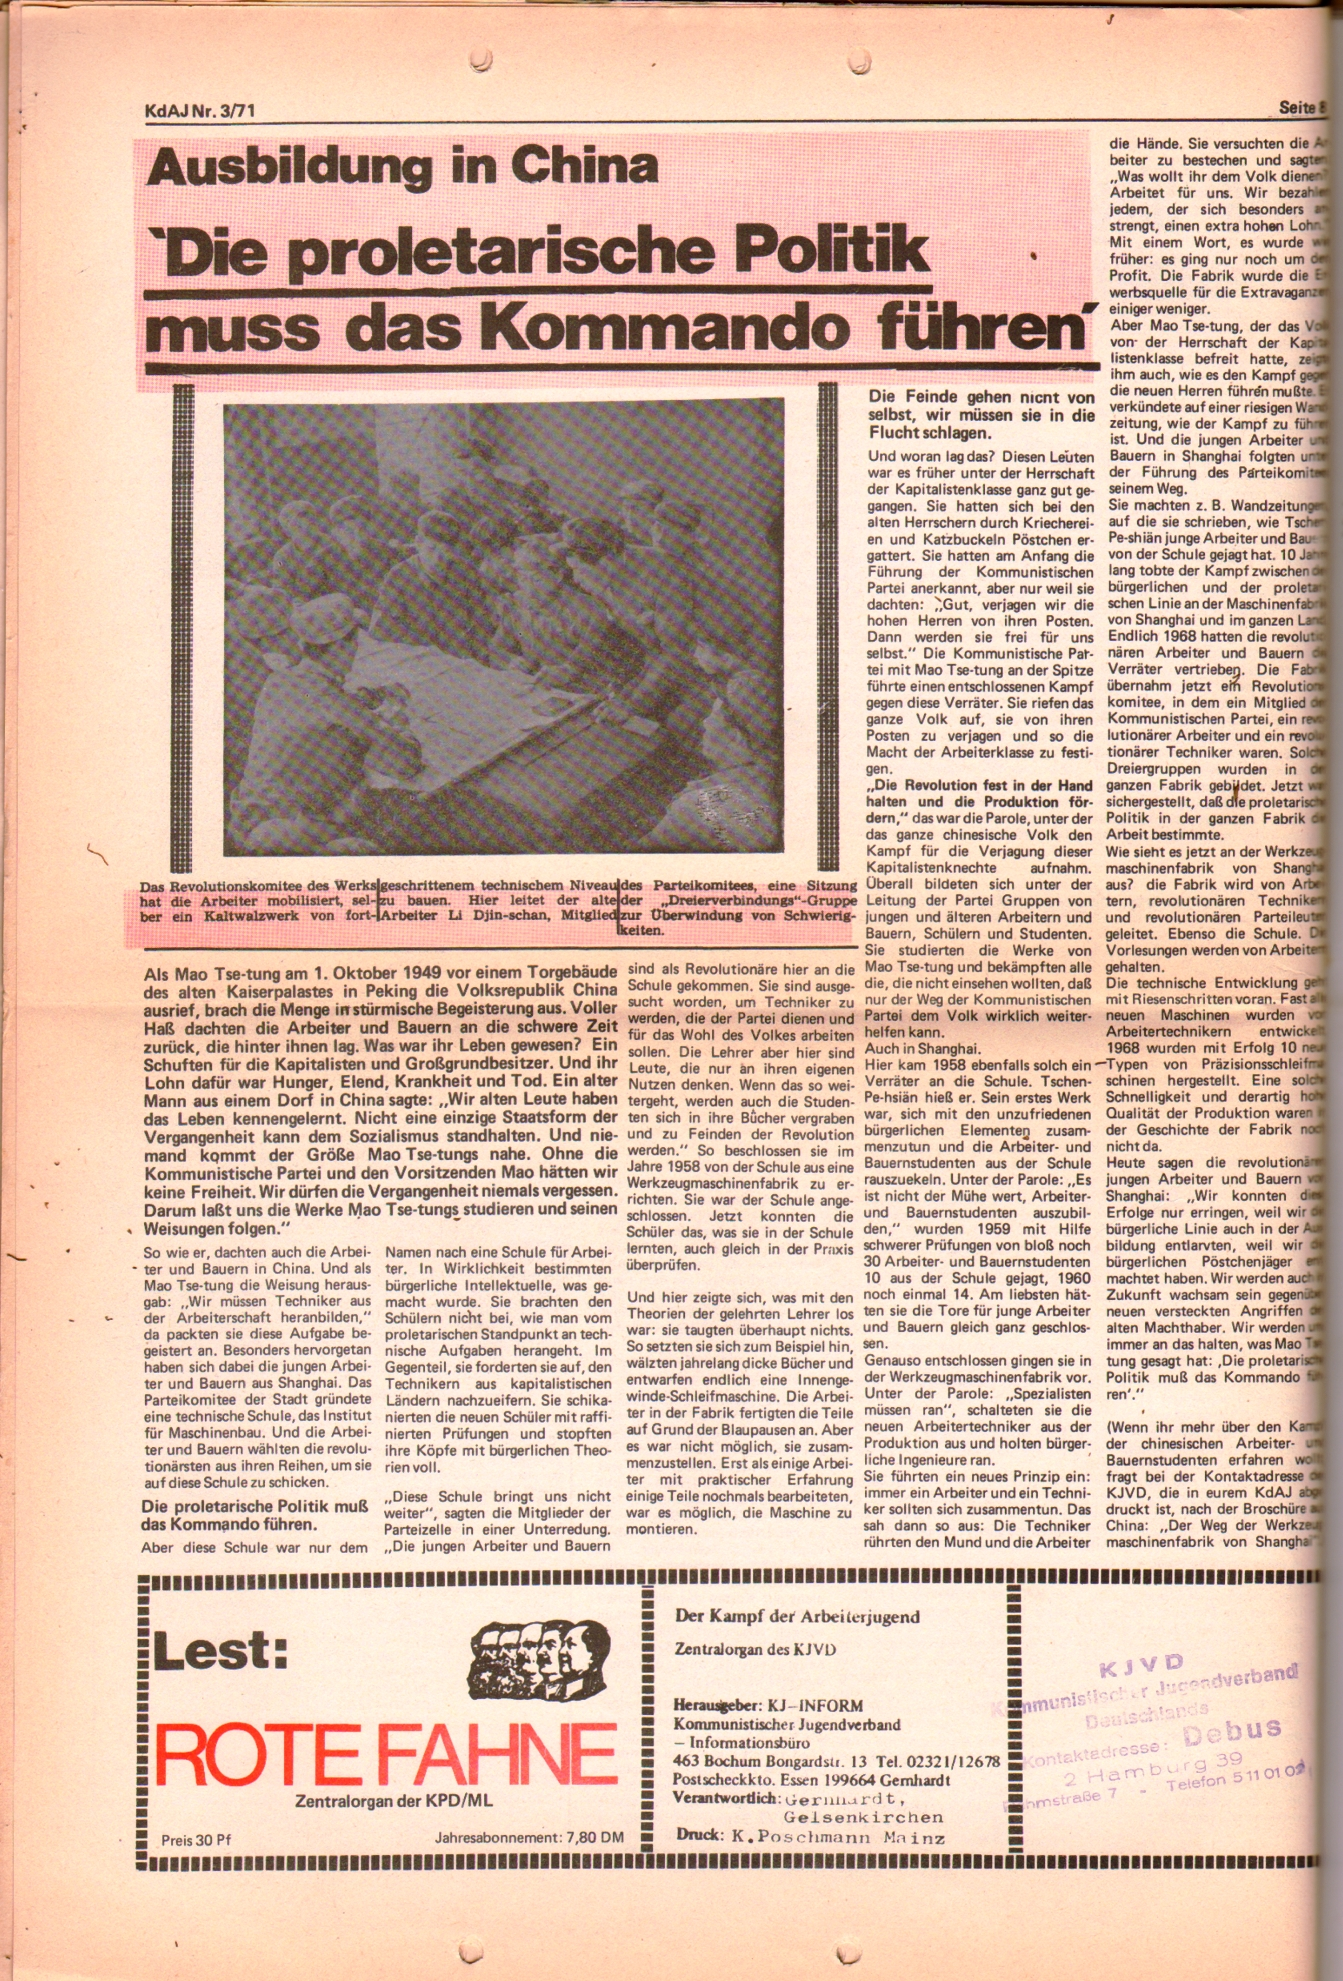 KDAJ, 2. Jg., März 1971, Nr. 3, Seite 8